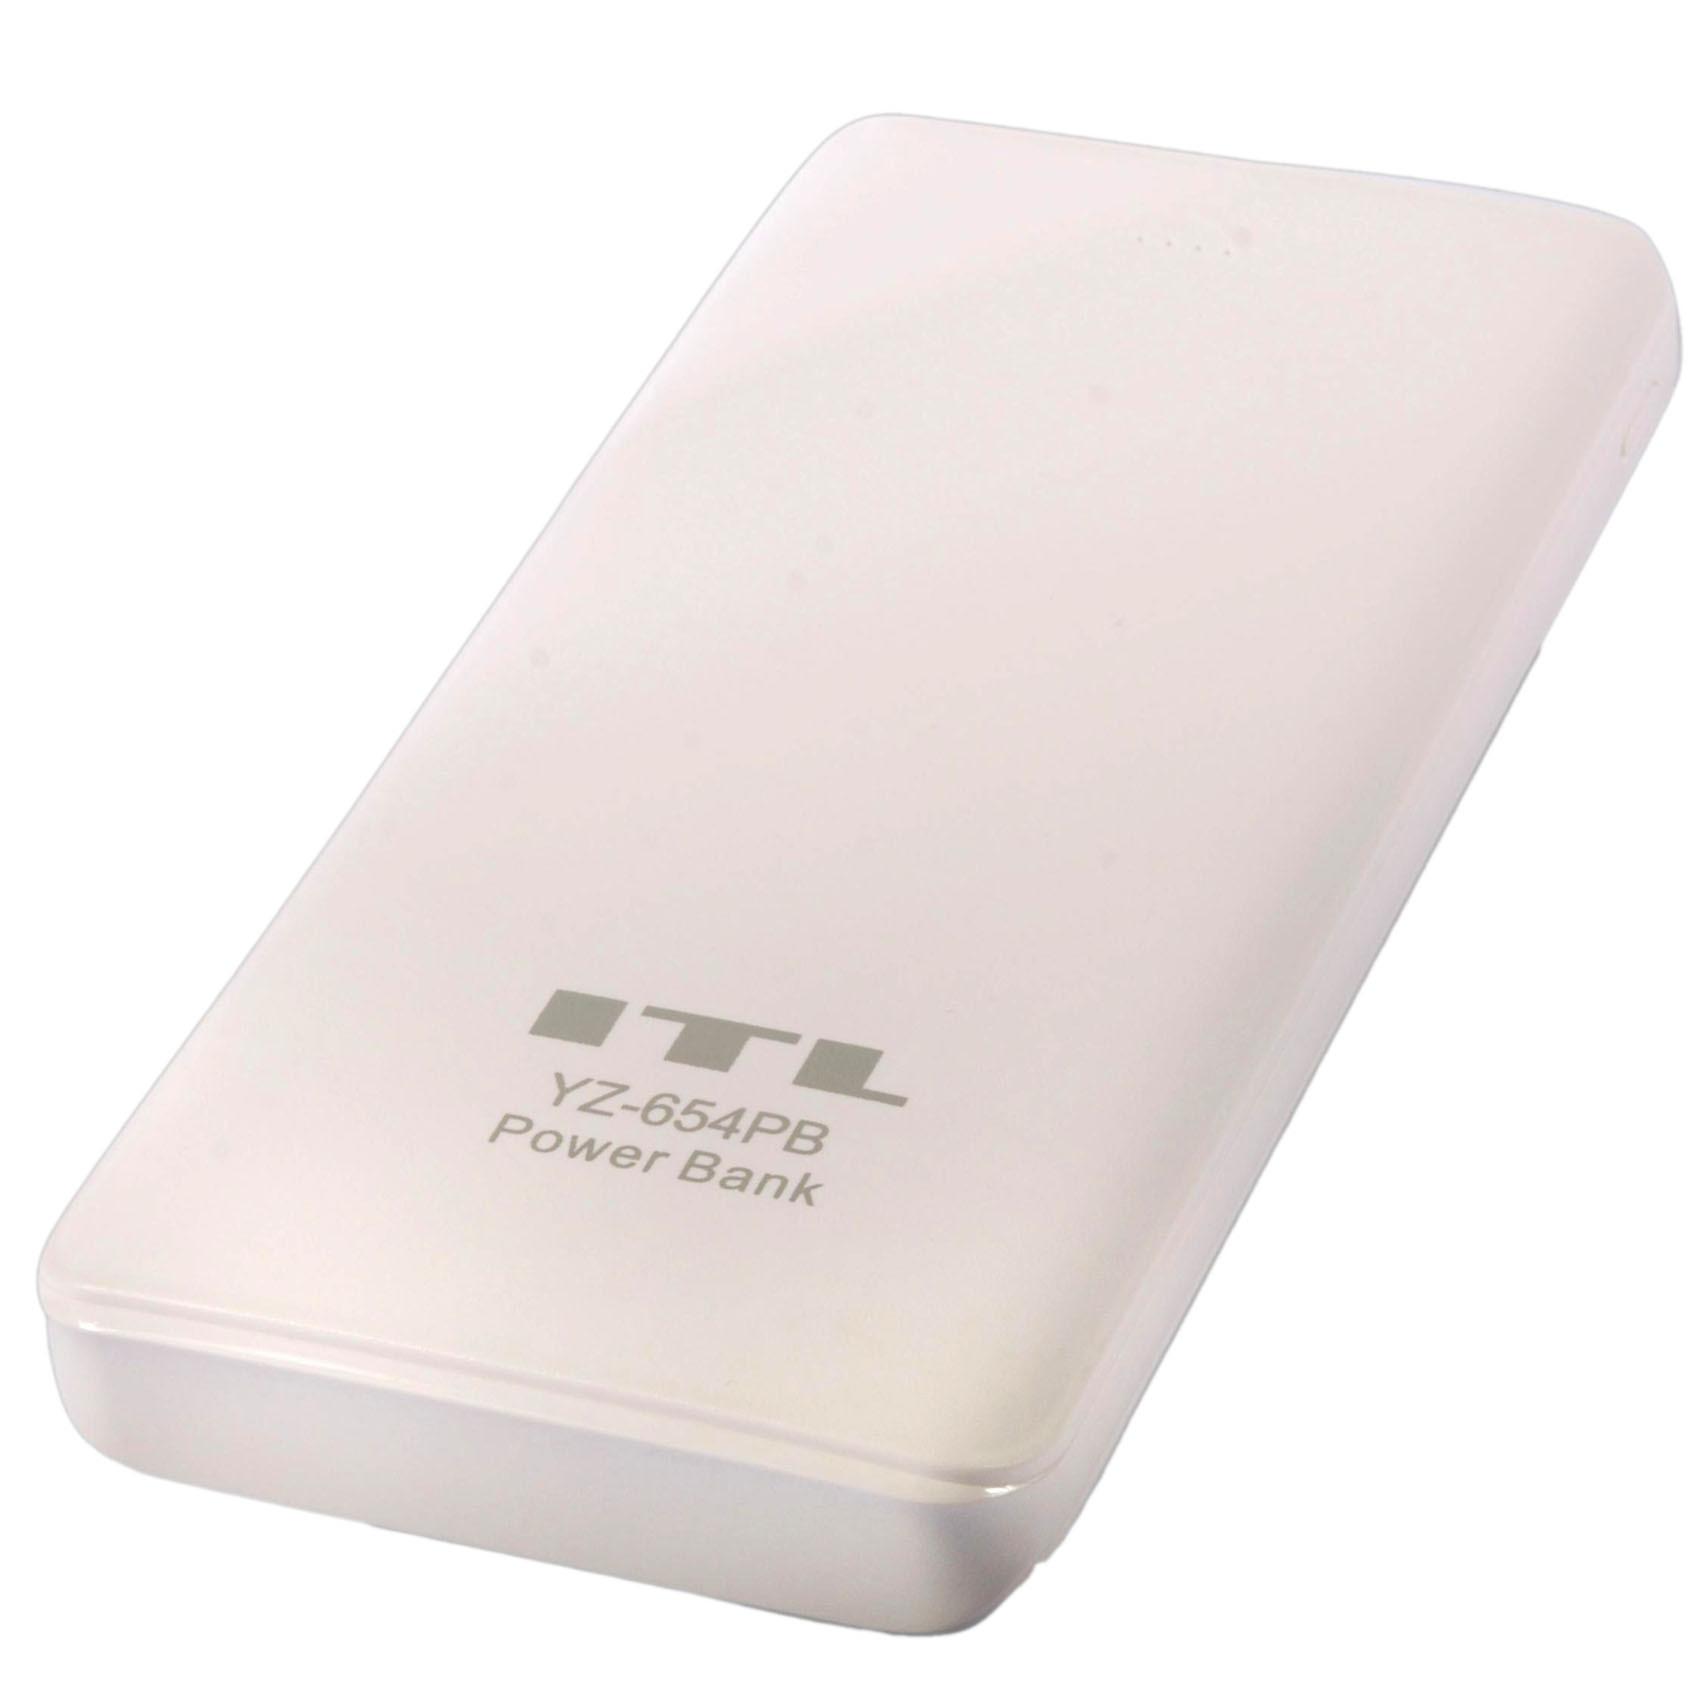 ITL POWER BANK 20000 MAH YZ-654PB